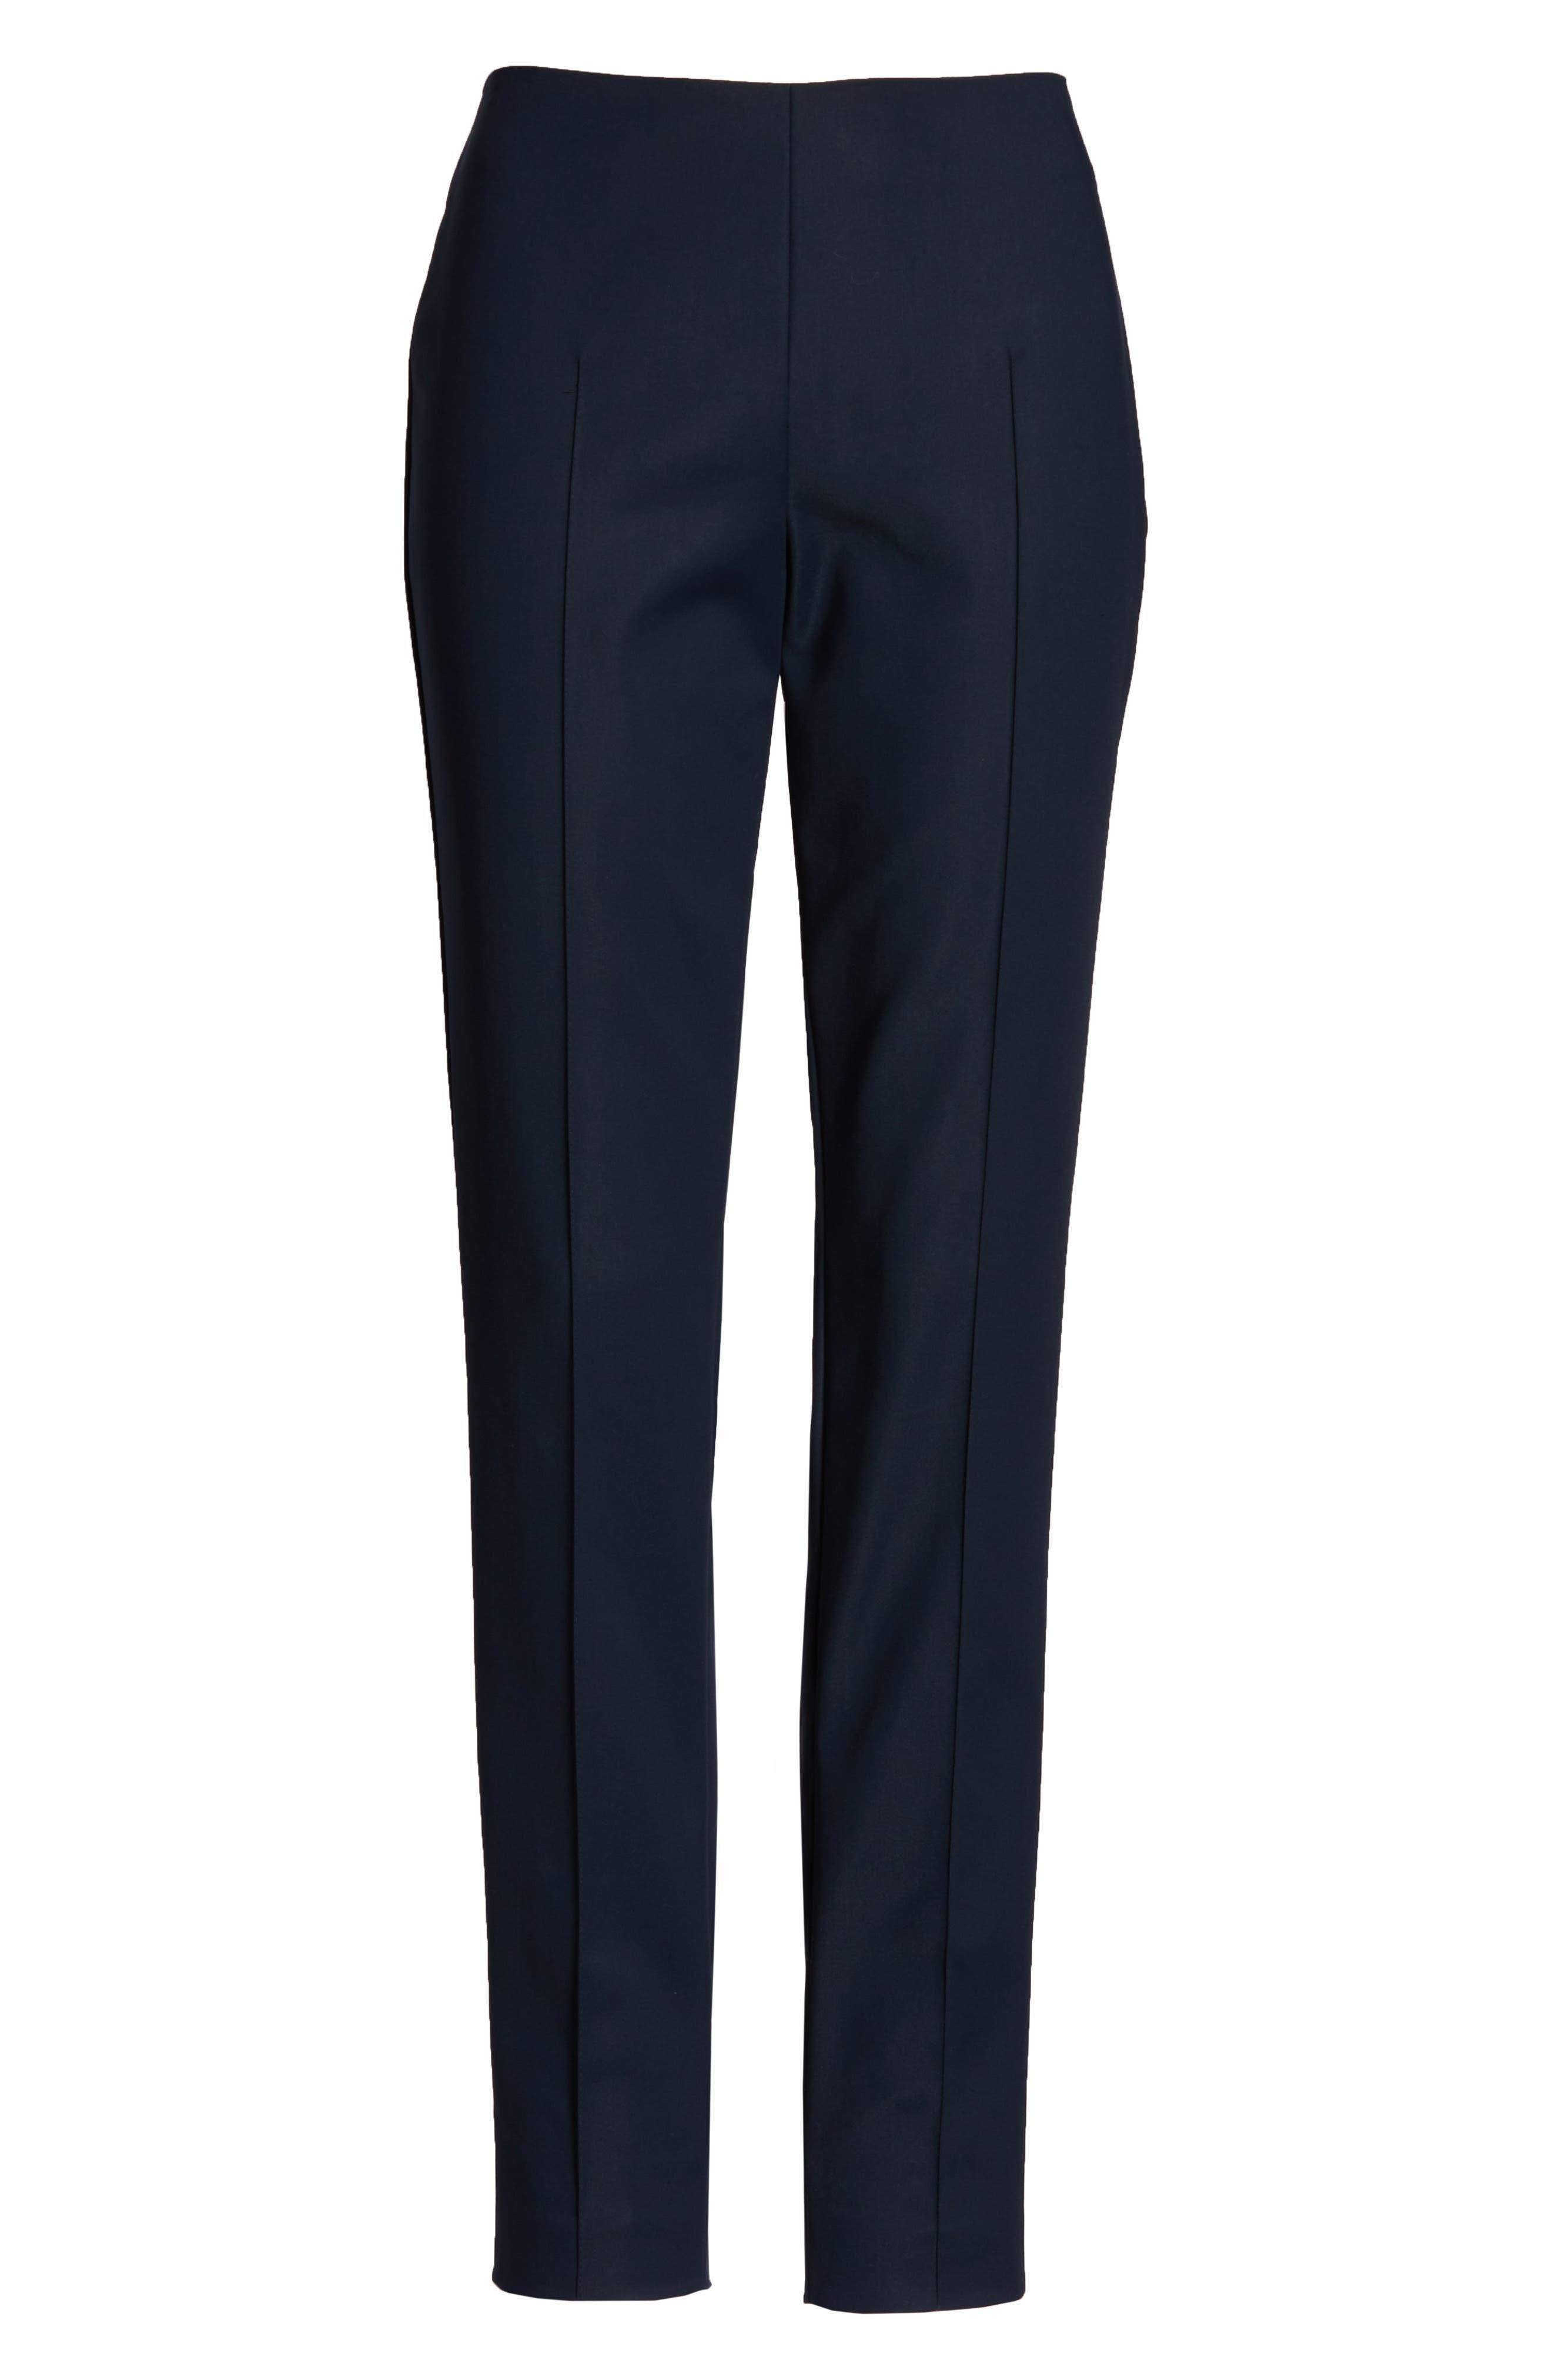 AKRIS, 'Melissa' Slim Techno Cotton Ankle Pants, Alternate thumbnail 8, color, NAVY